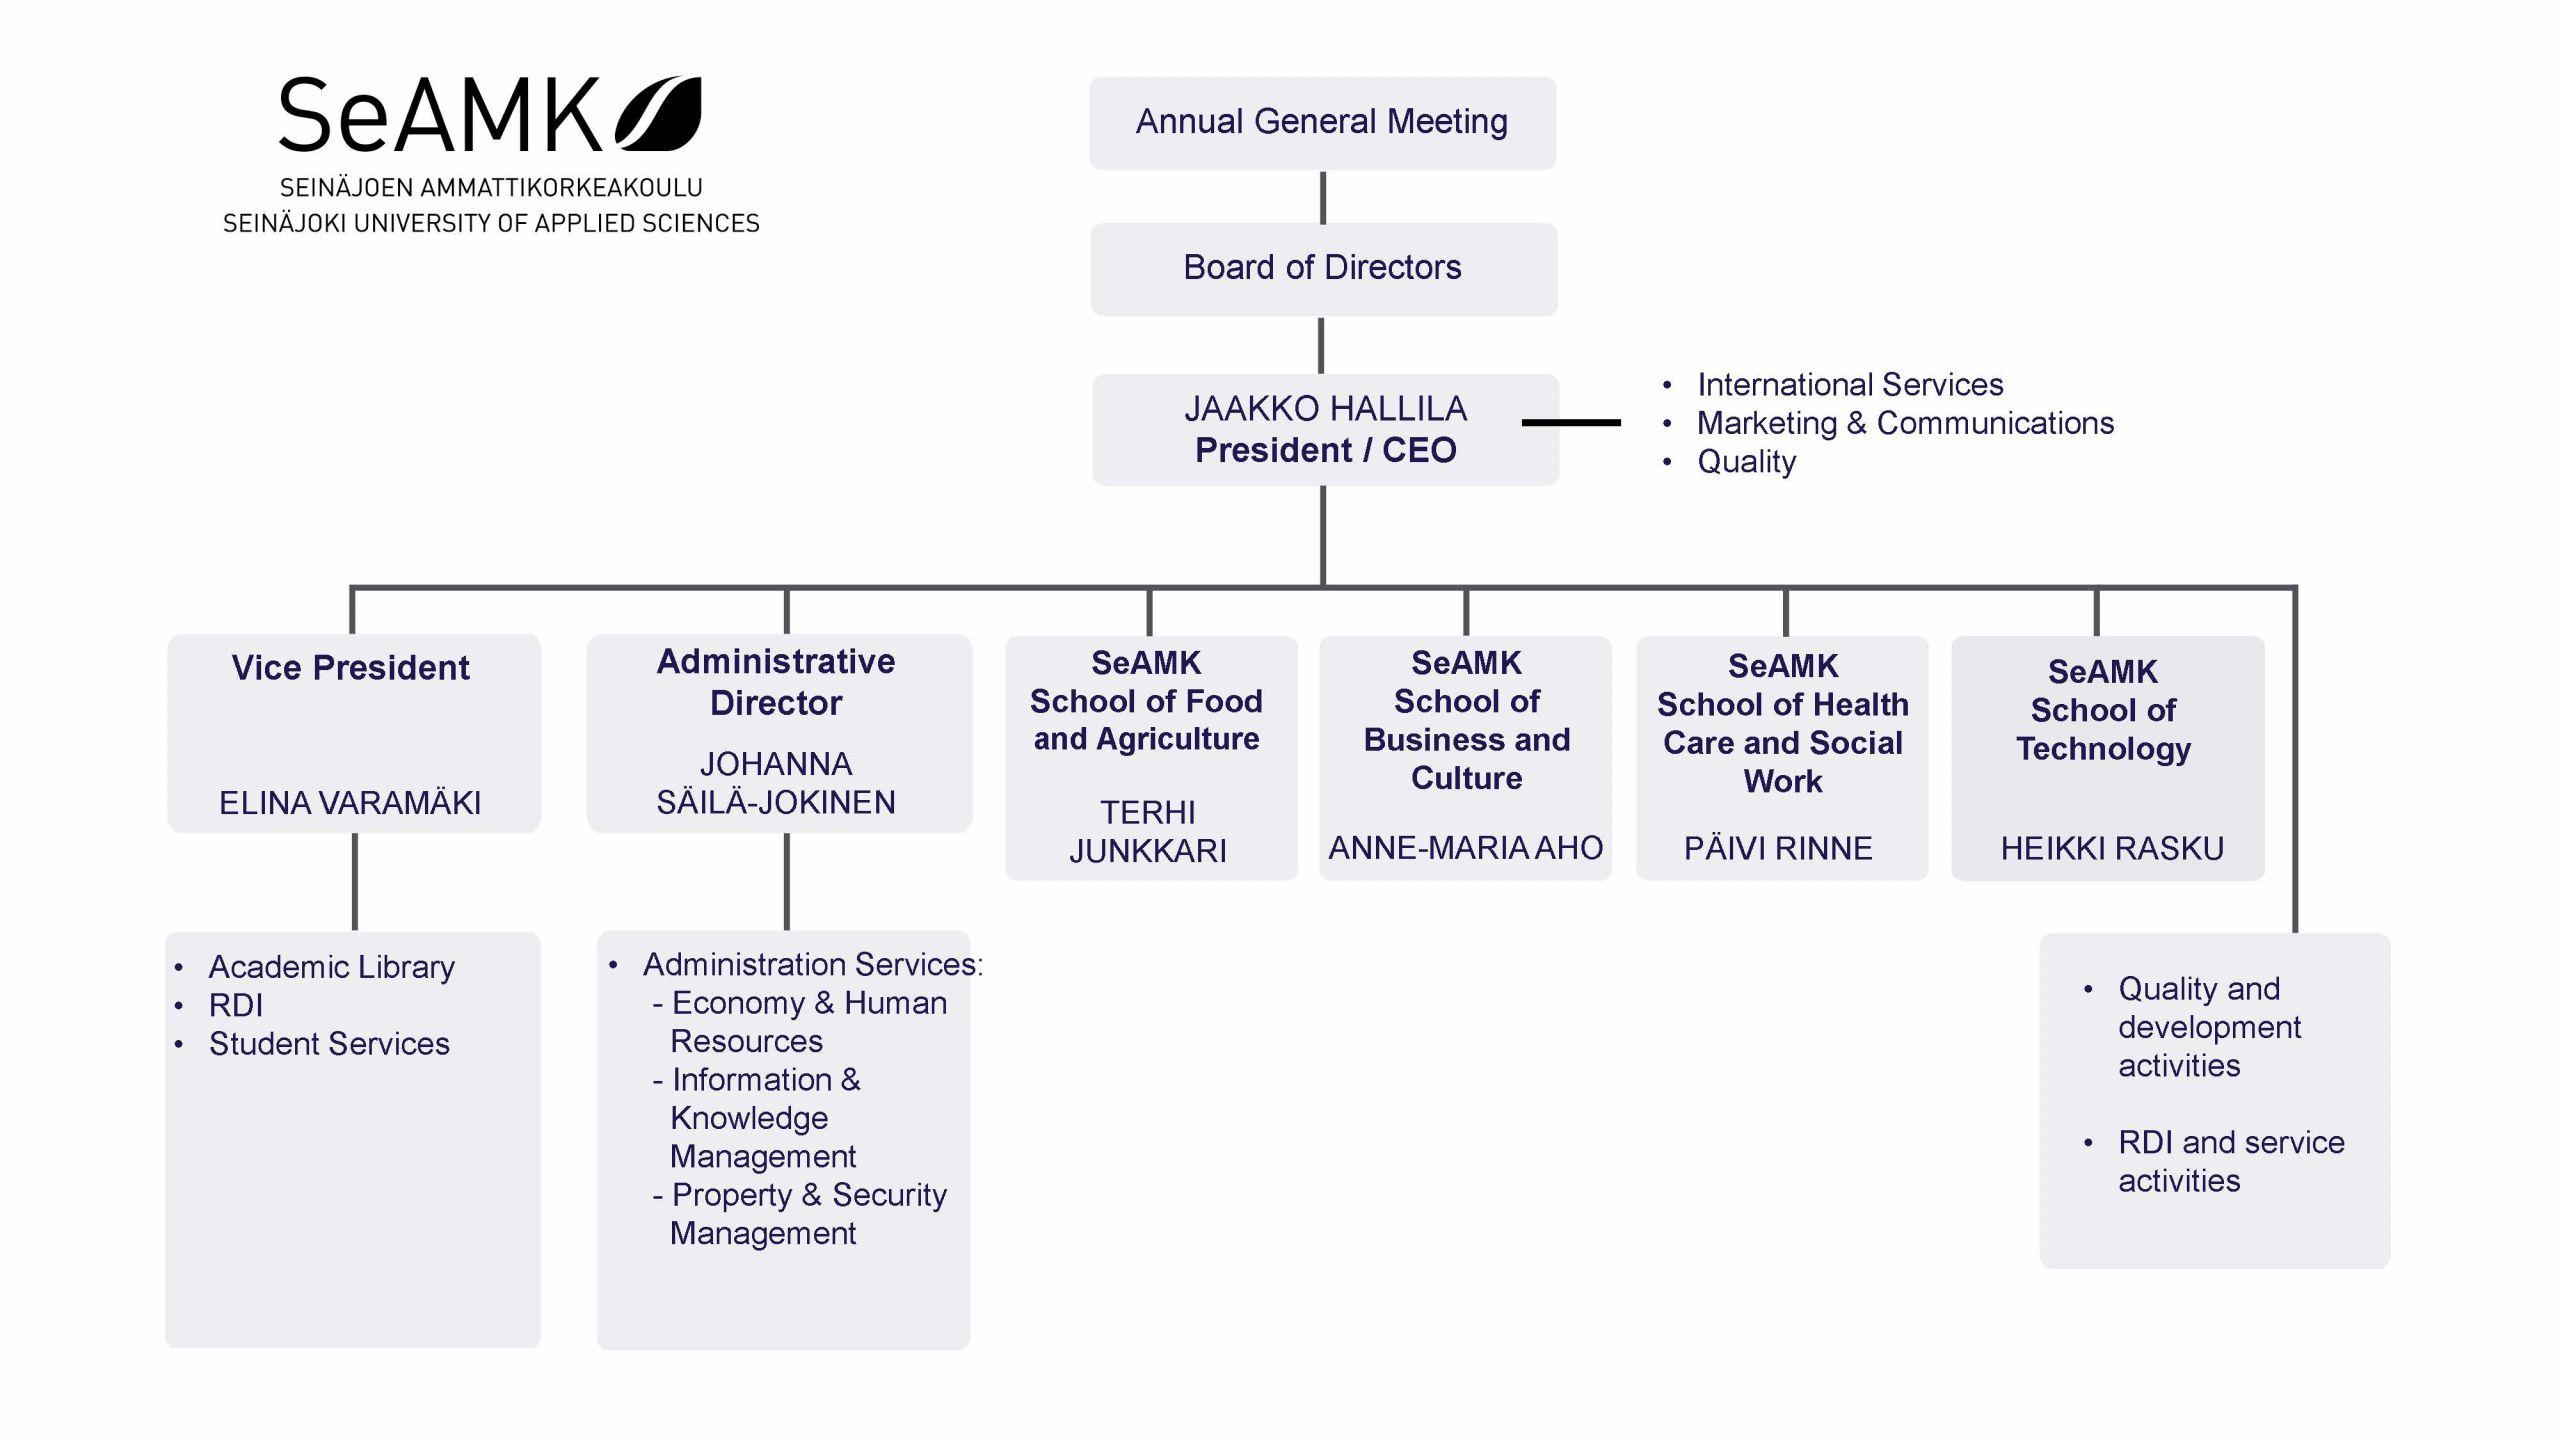 SeAMK's organisation chart